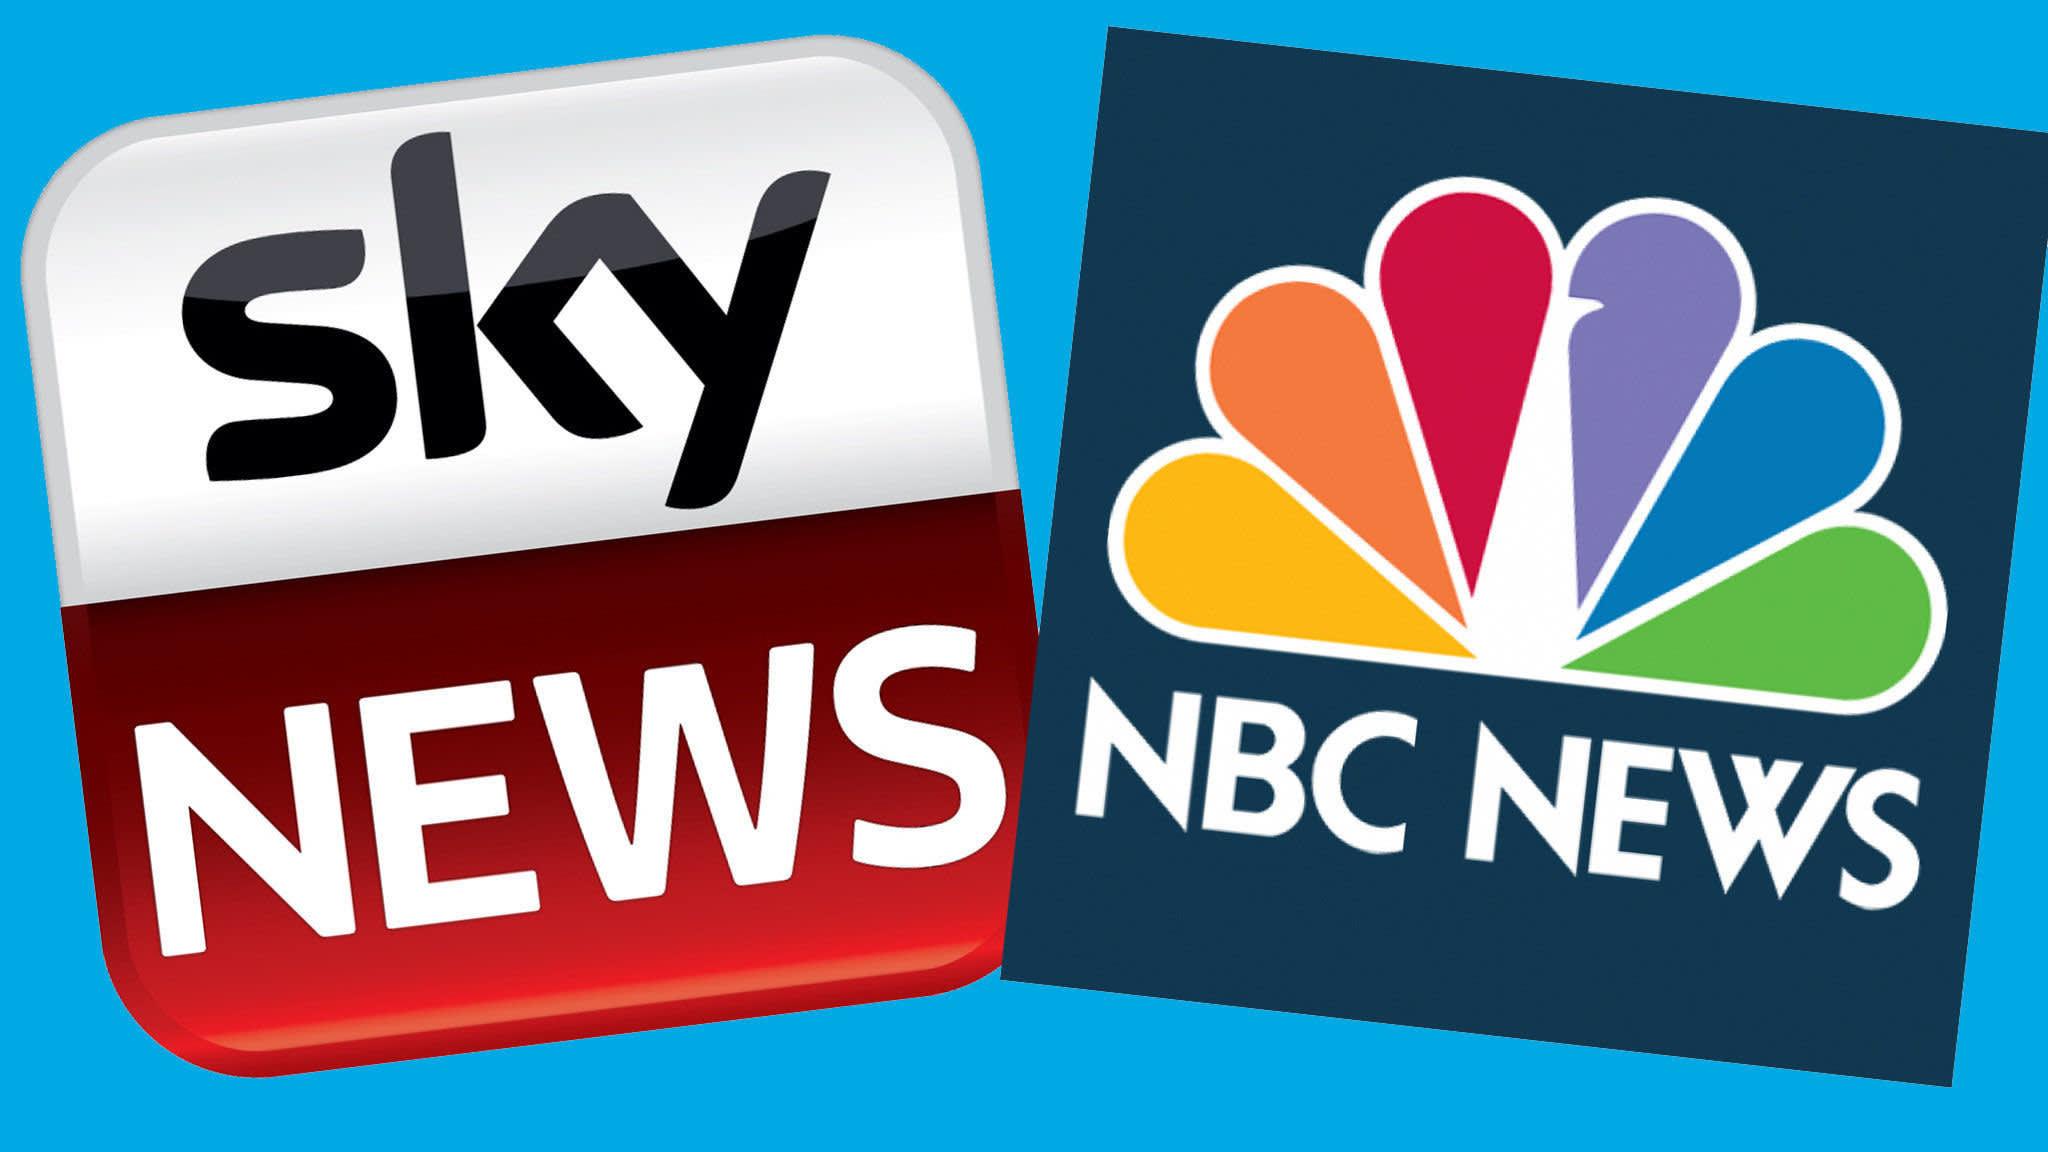 NBC News + Sky News